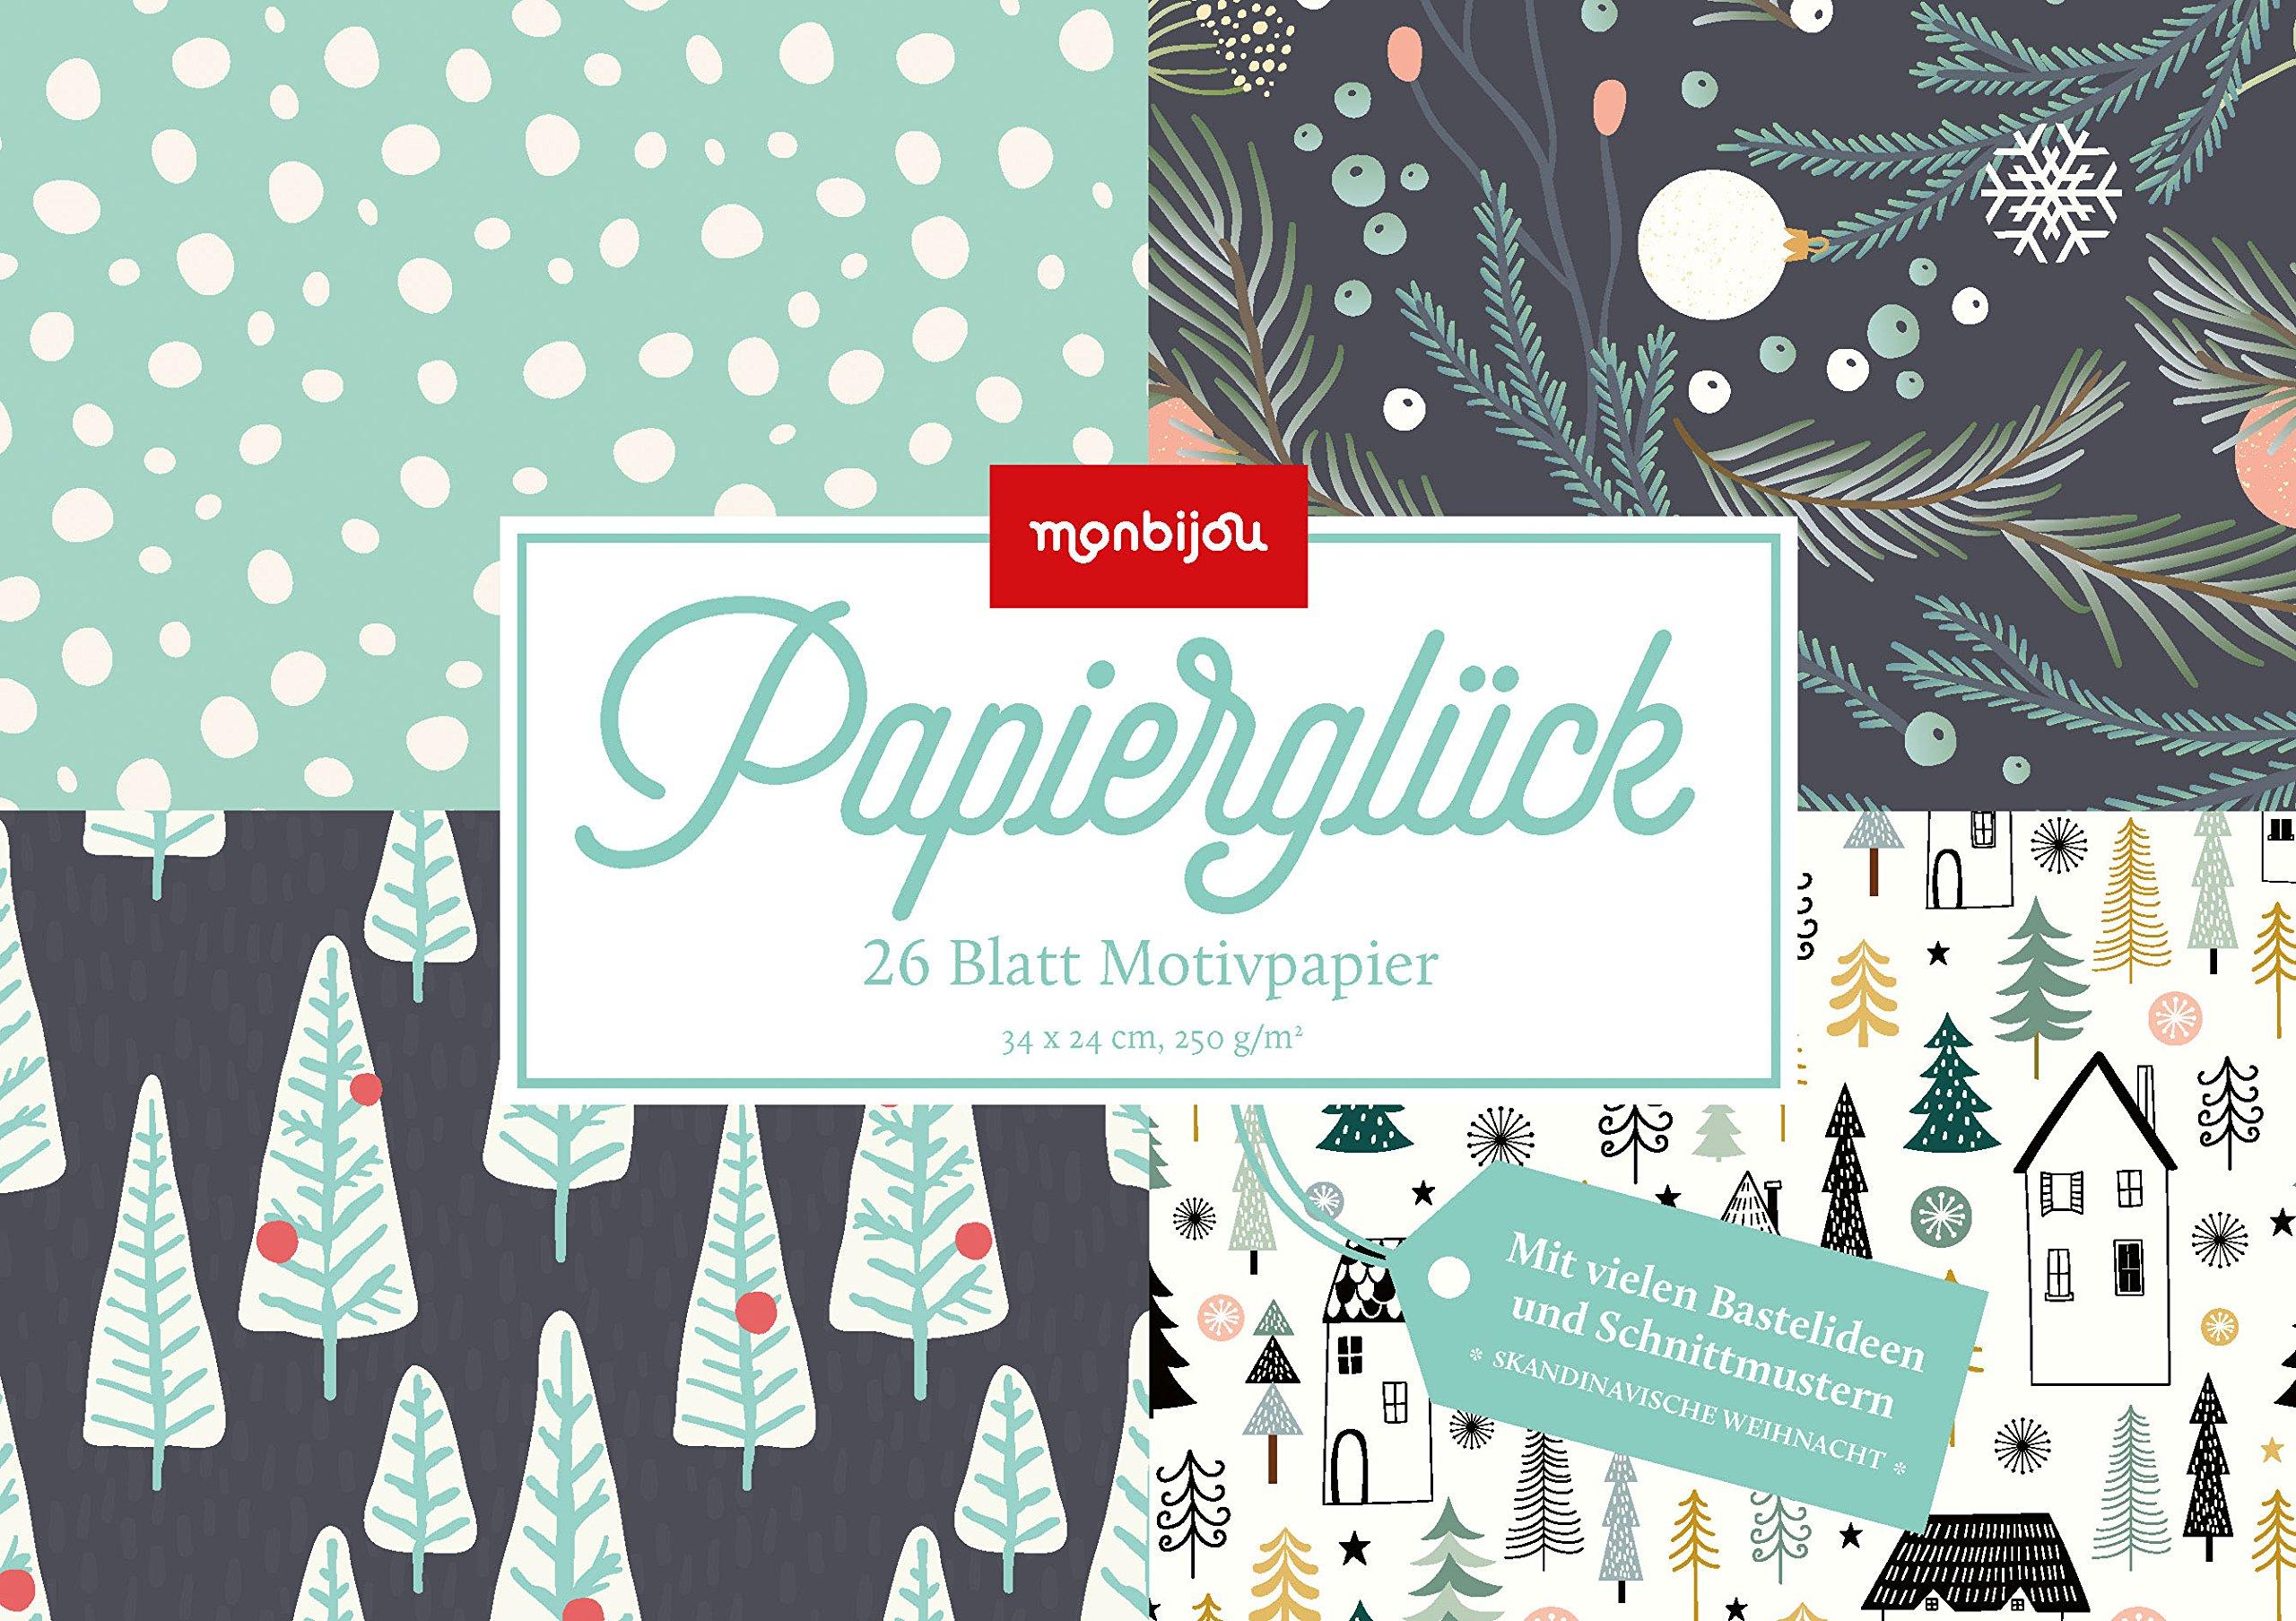 Papierglück - Design Weihnachten skandinavisch: Motivpapier (monbijou)